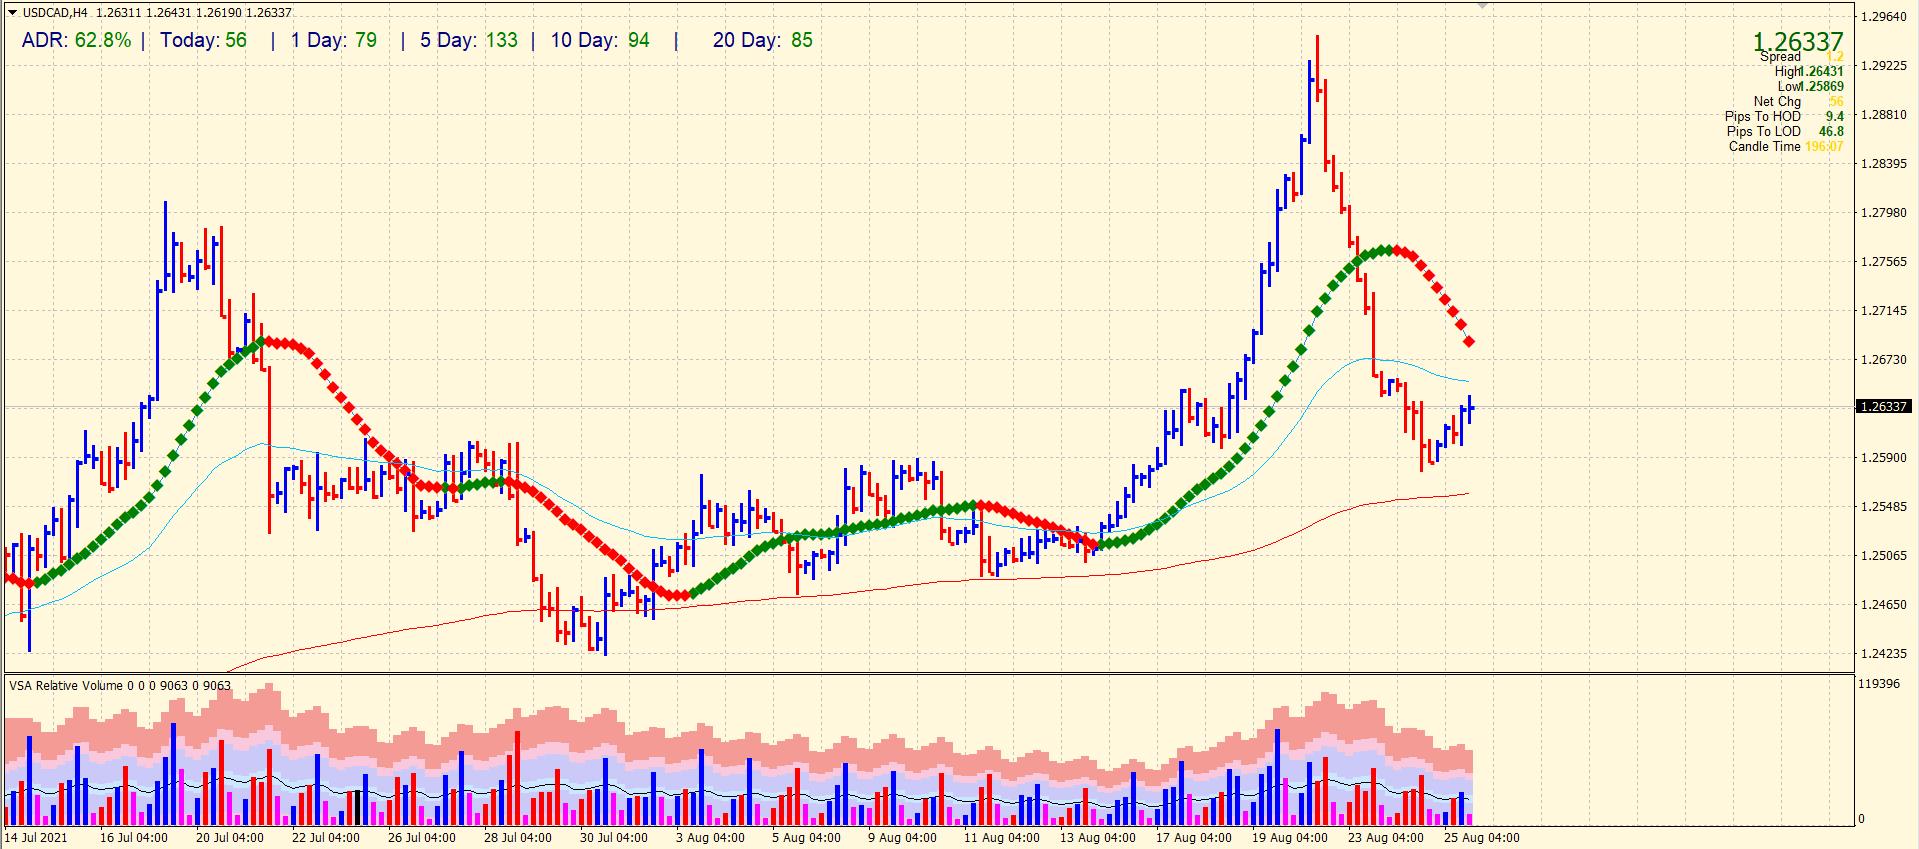 USD/CAD 4-hour price chart analysis